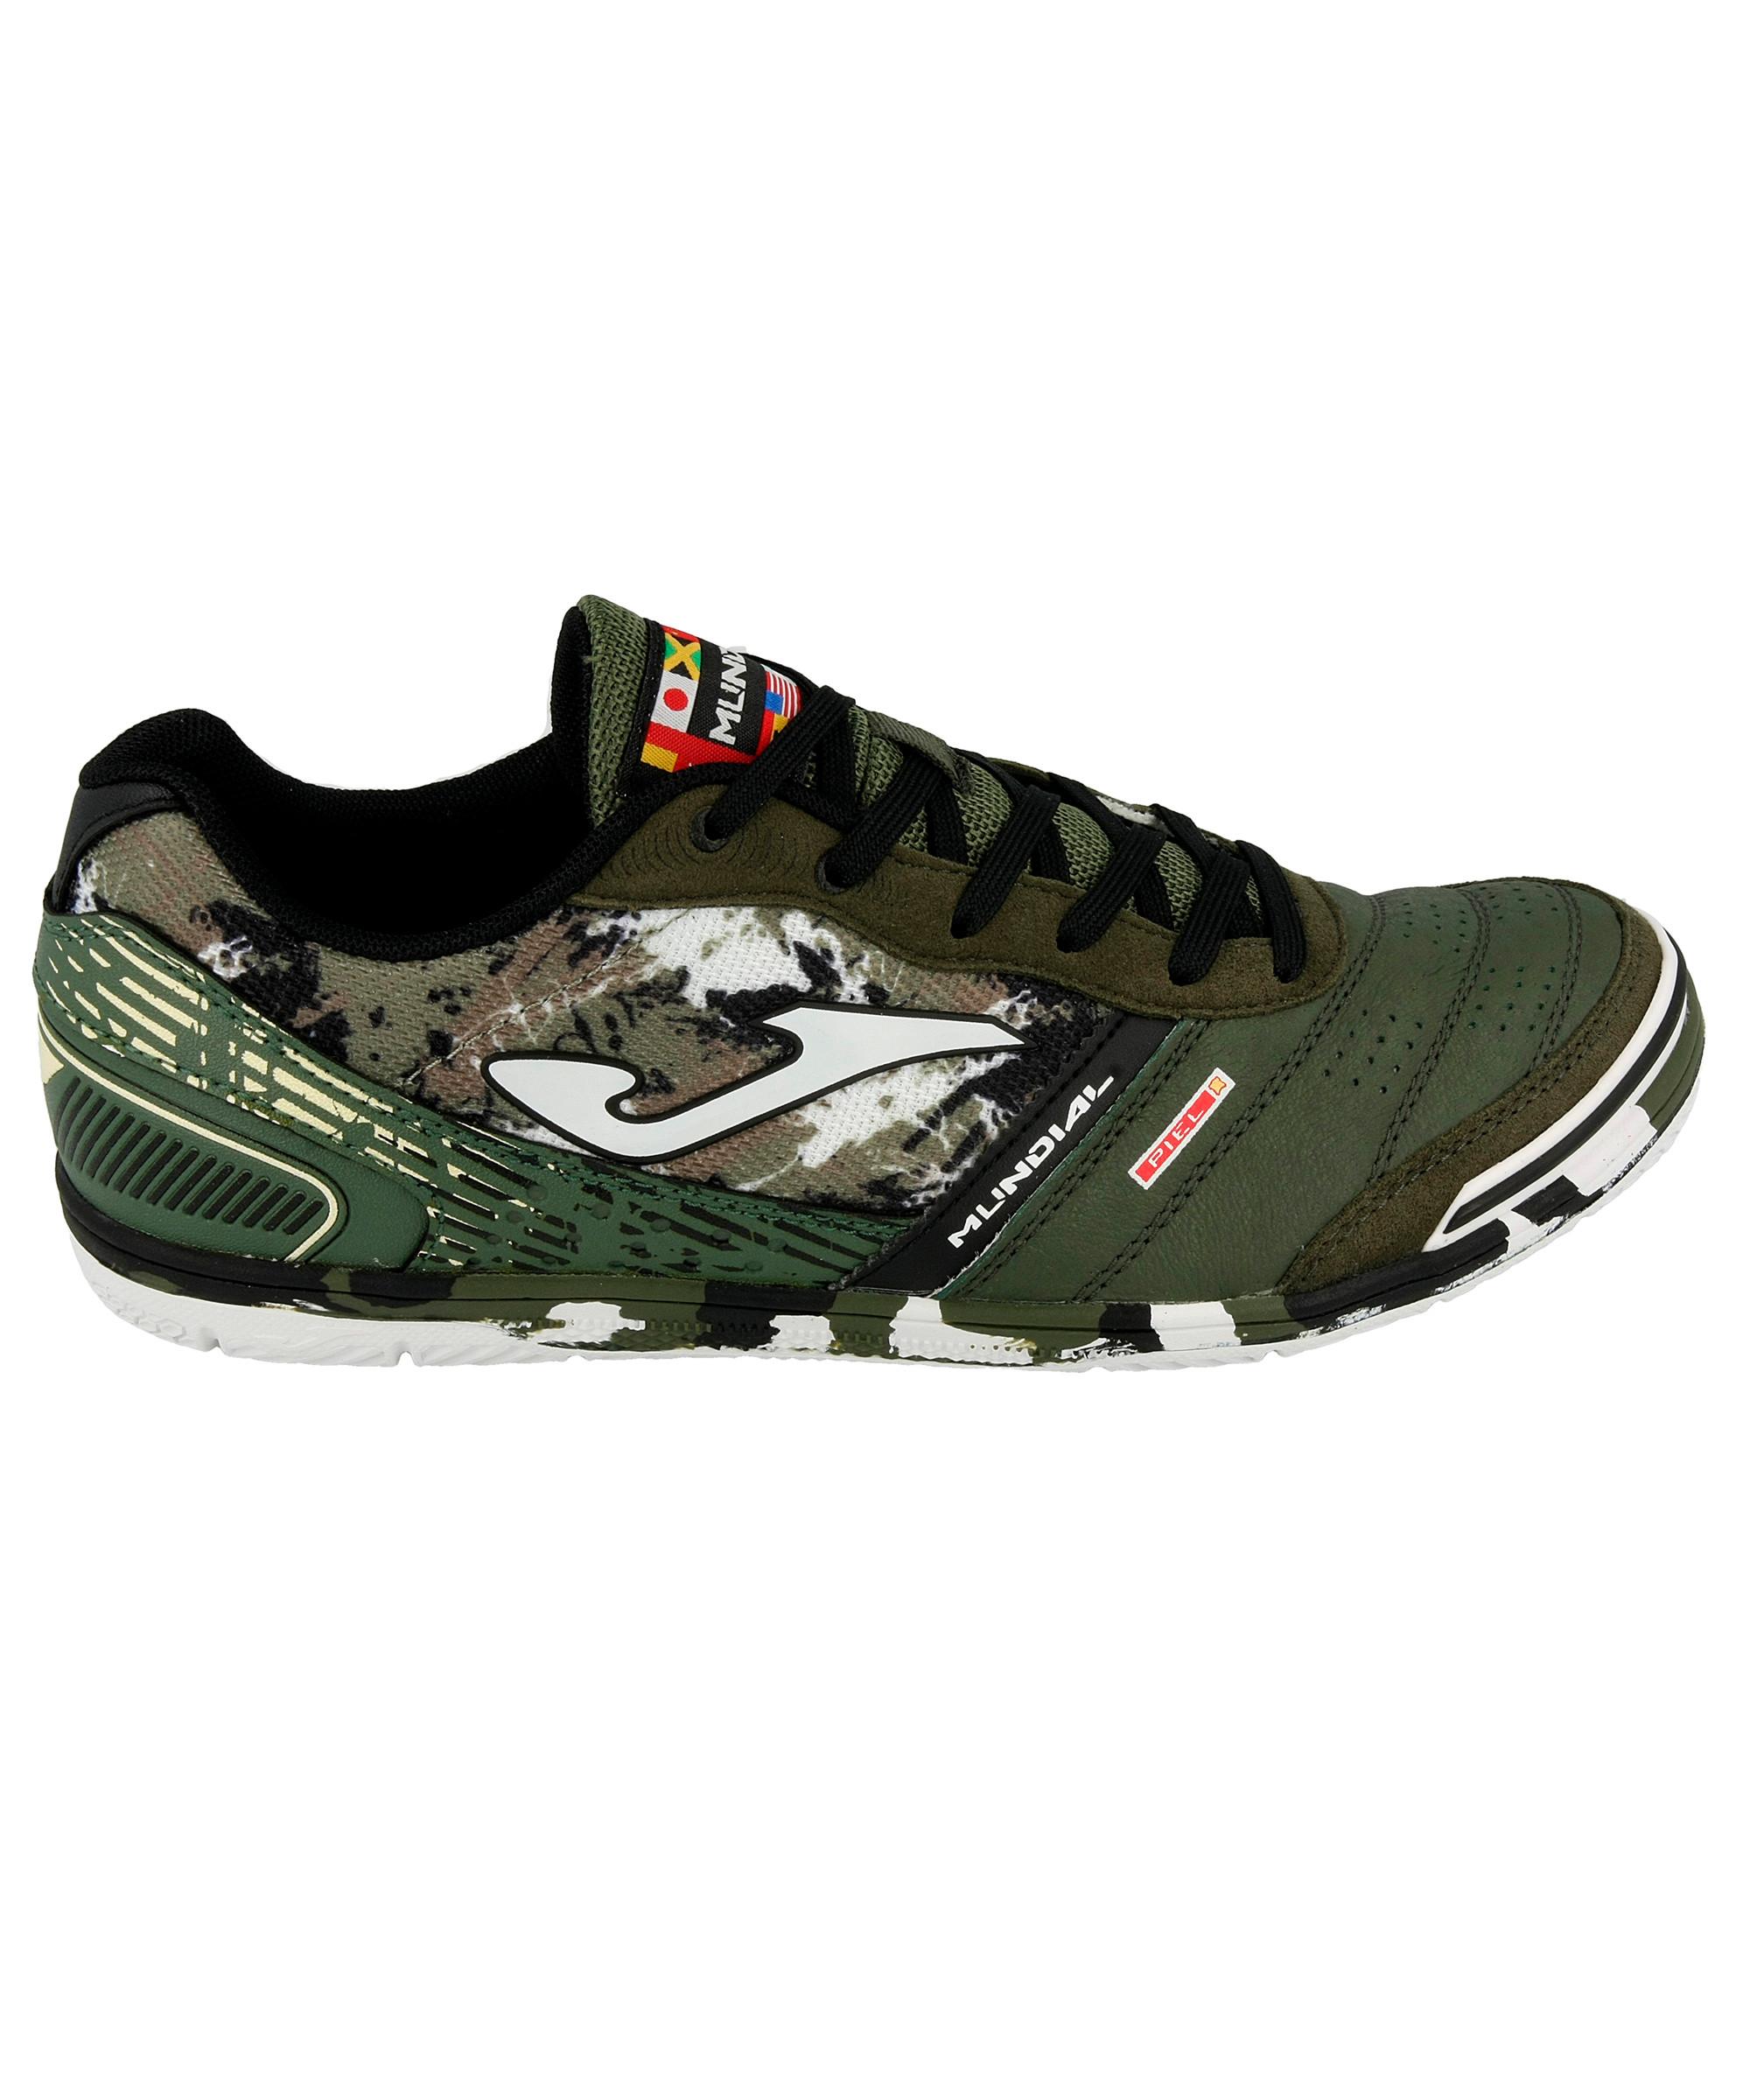 Football-shoes-Joma-Scarpe-Calcio-Mundial-Verde-Indoor-IC-Sala-Futsal-parquet miniatura 3